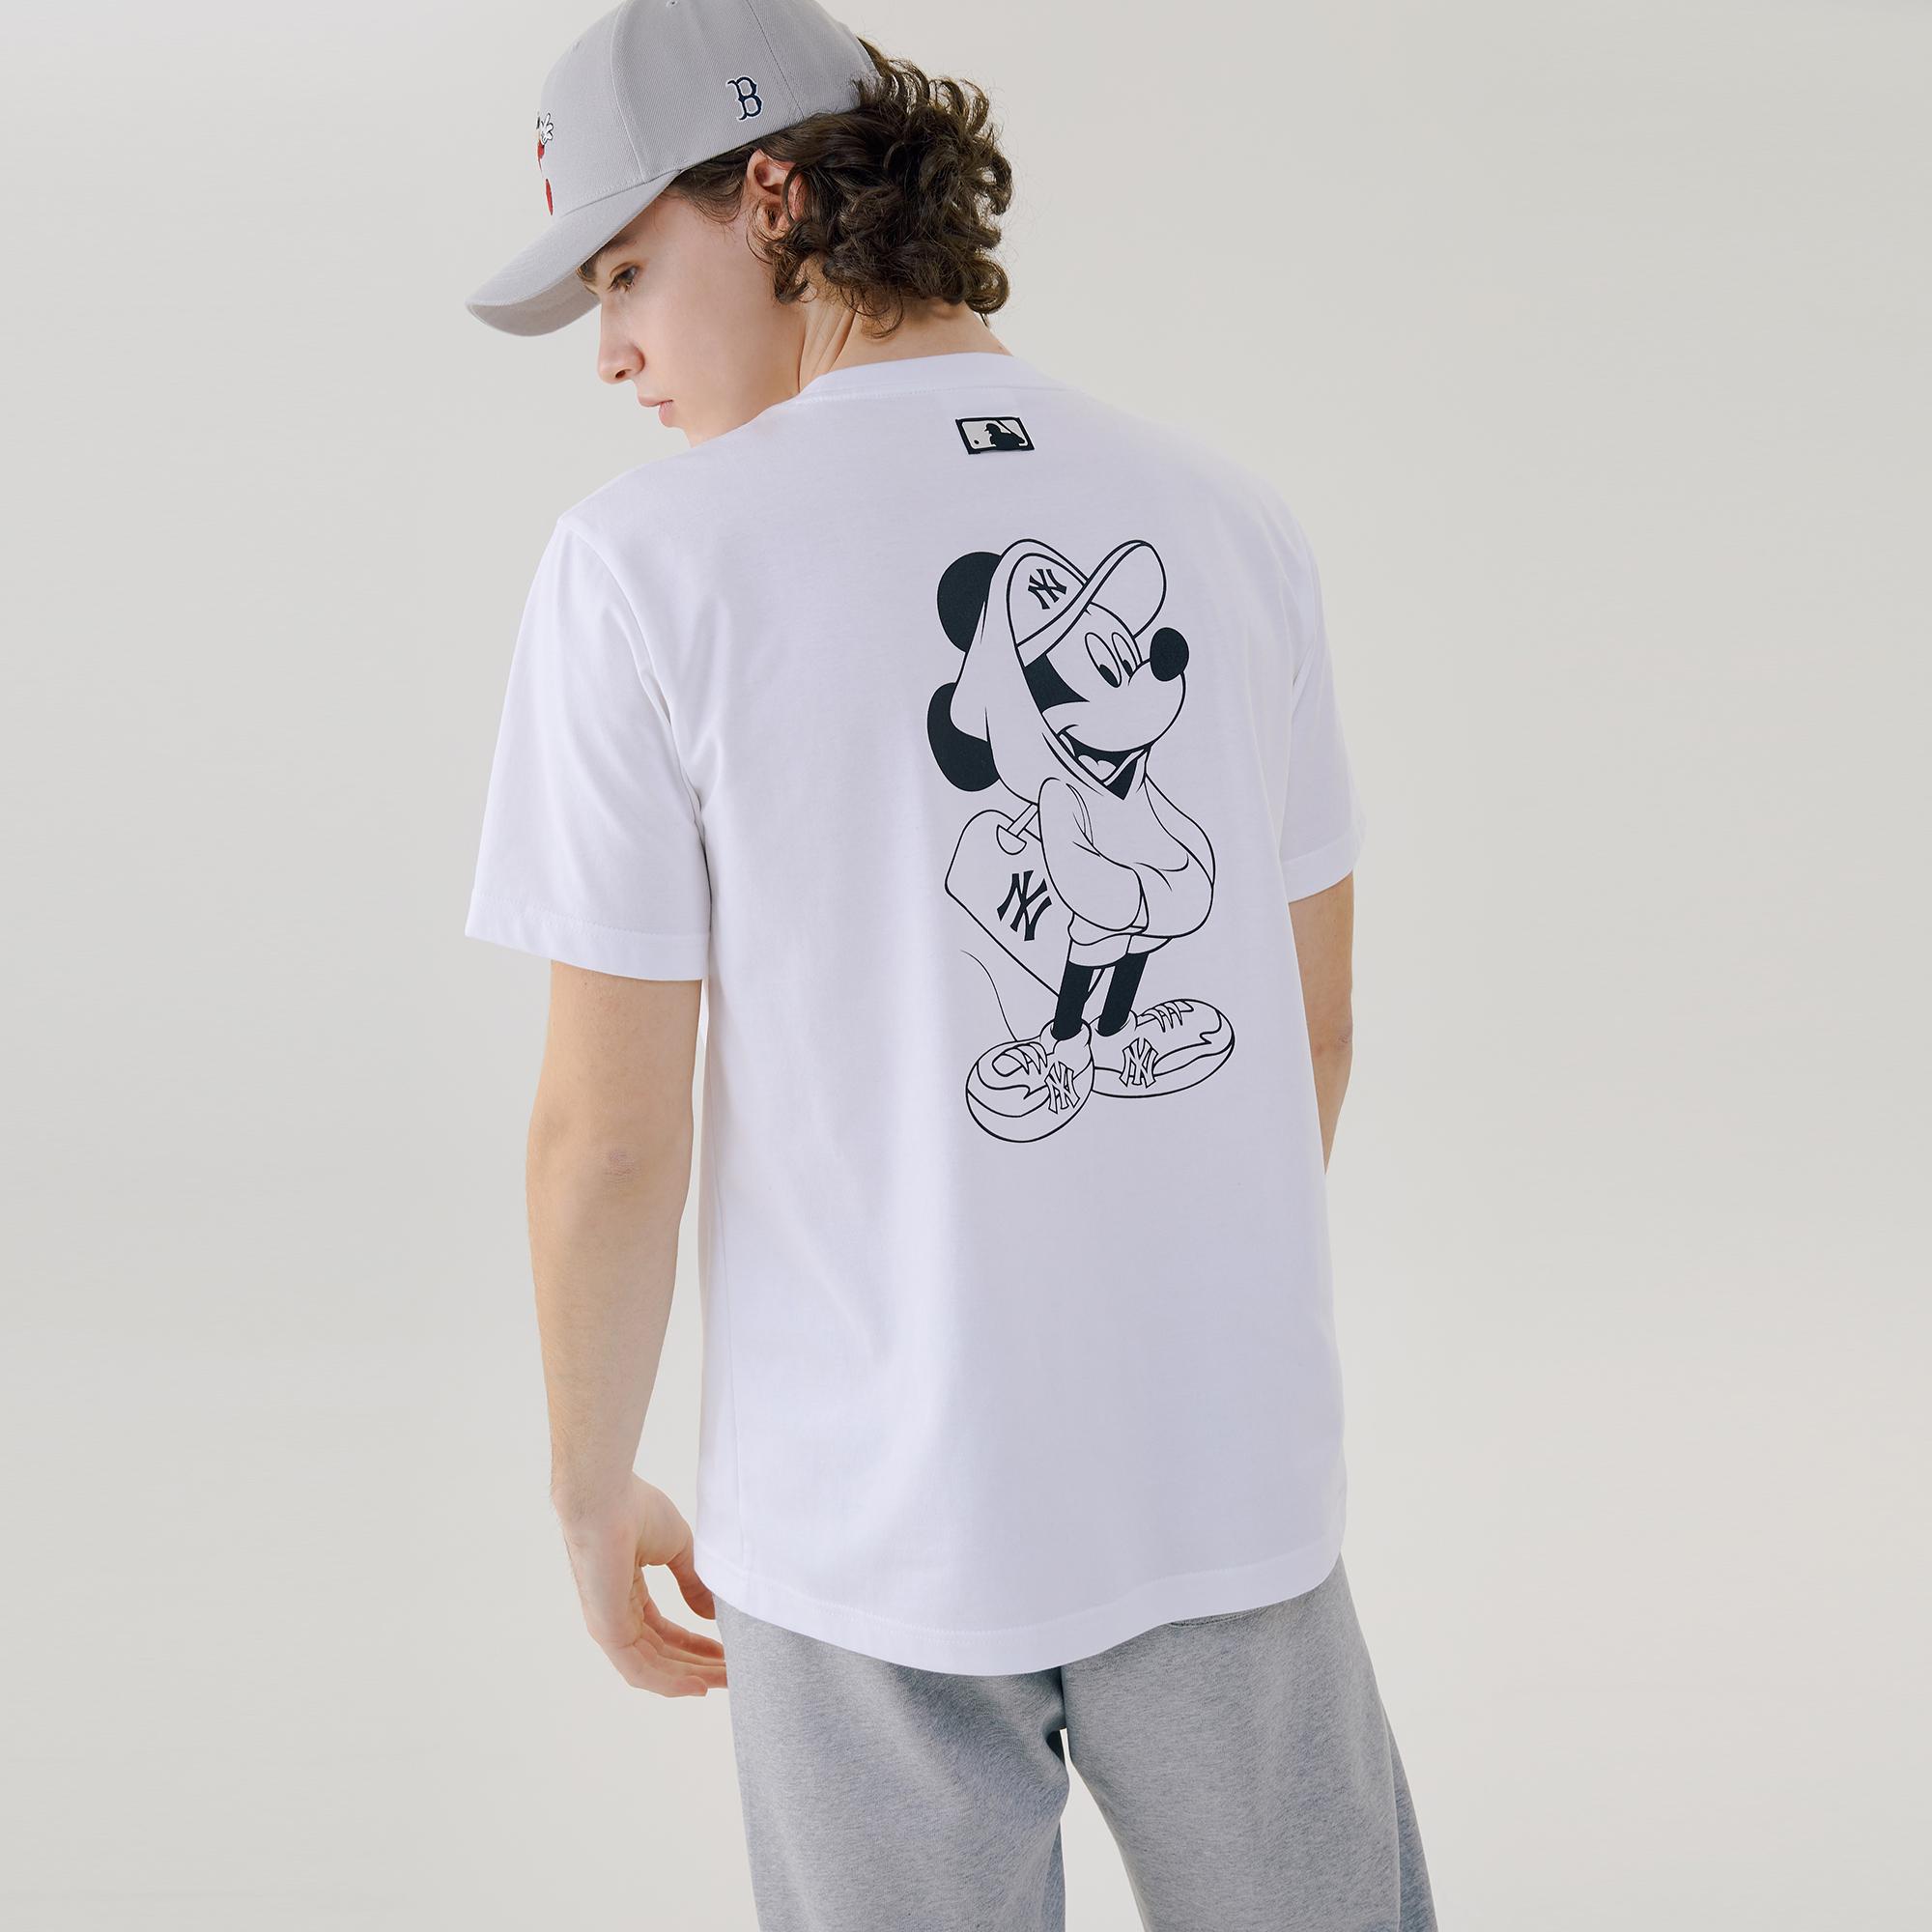 MLB X DISNEY 반팔 티셔츠 뉴욕양키스